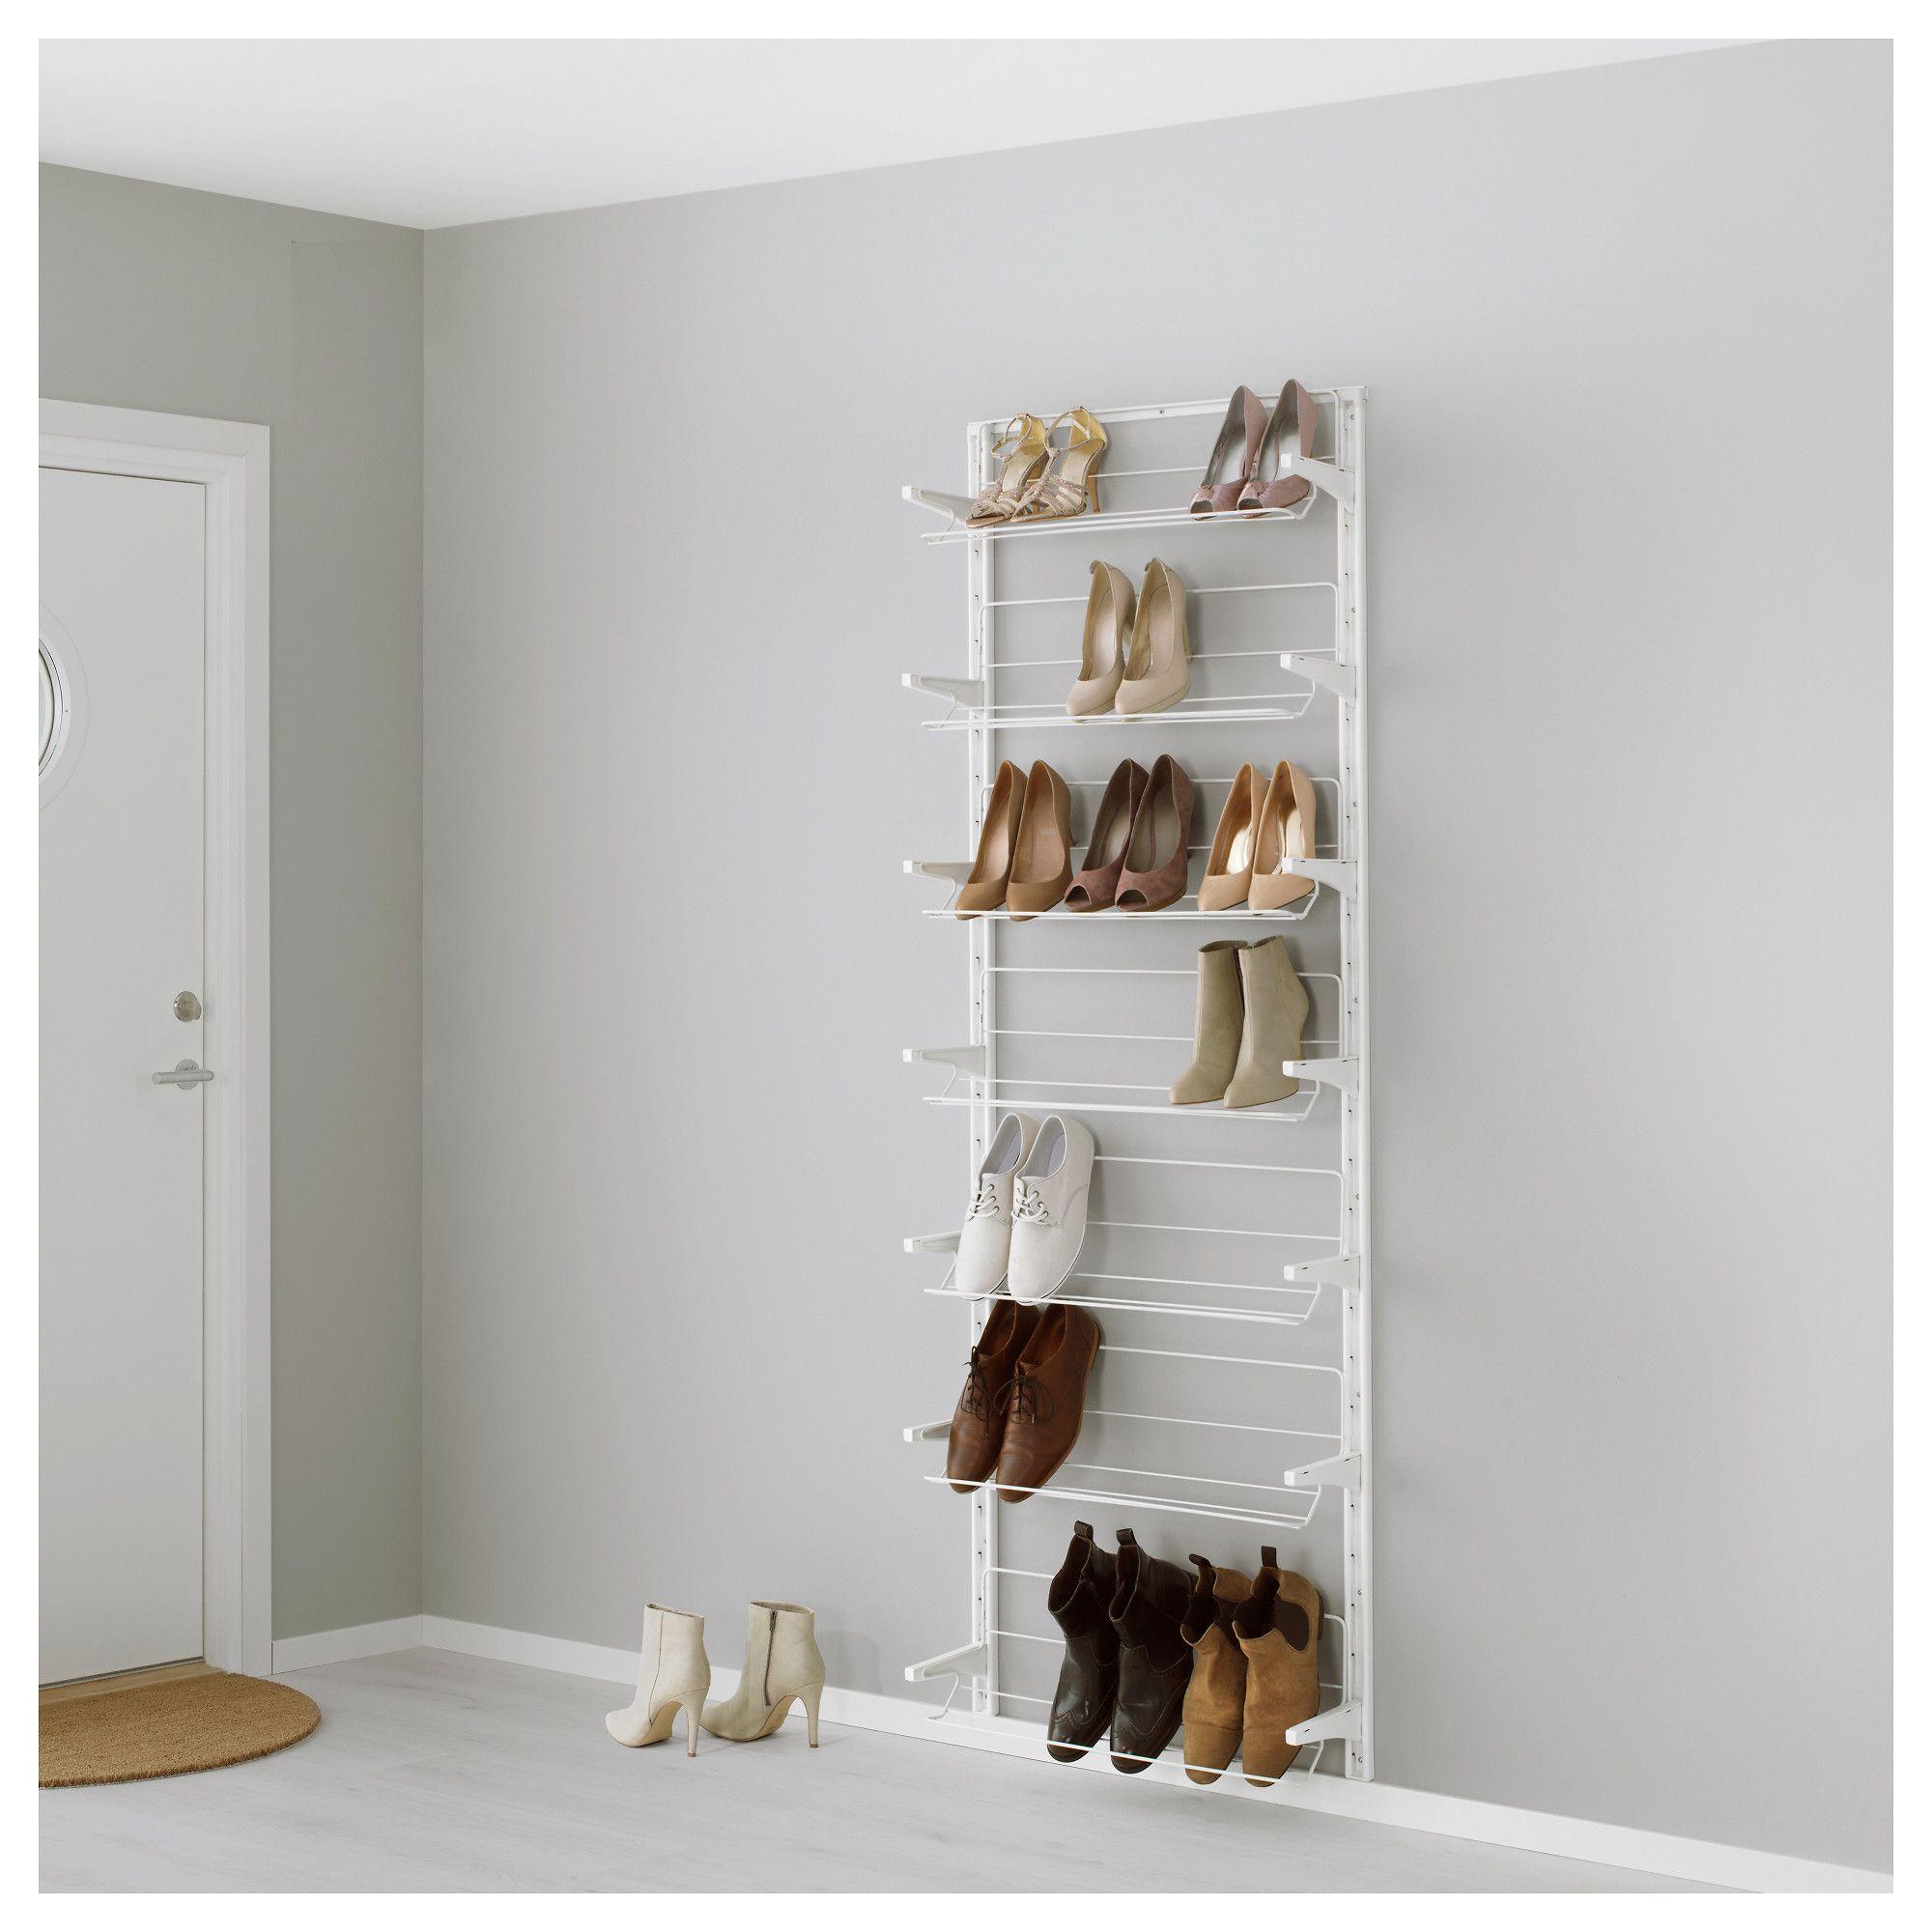 Ikea Us Furniture And Home Furnishings Shoe Organizer Ikea Shoe Organiser Ikea Algot